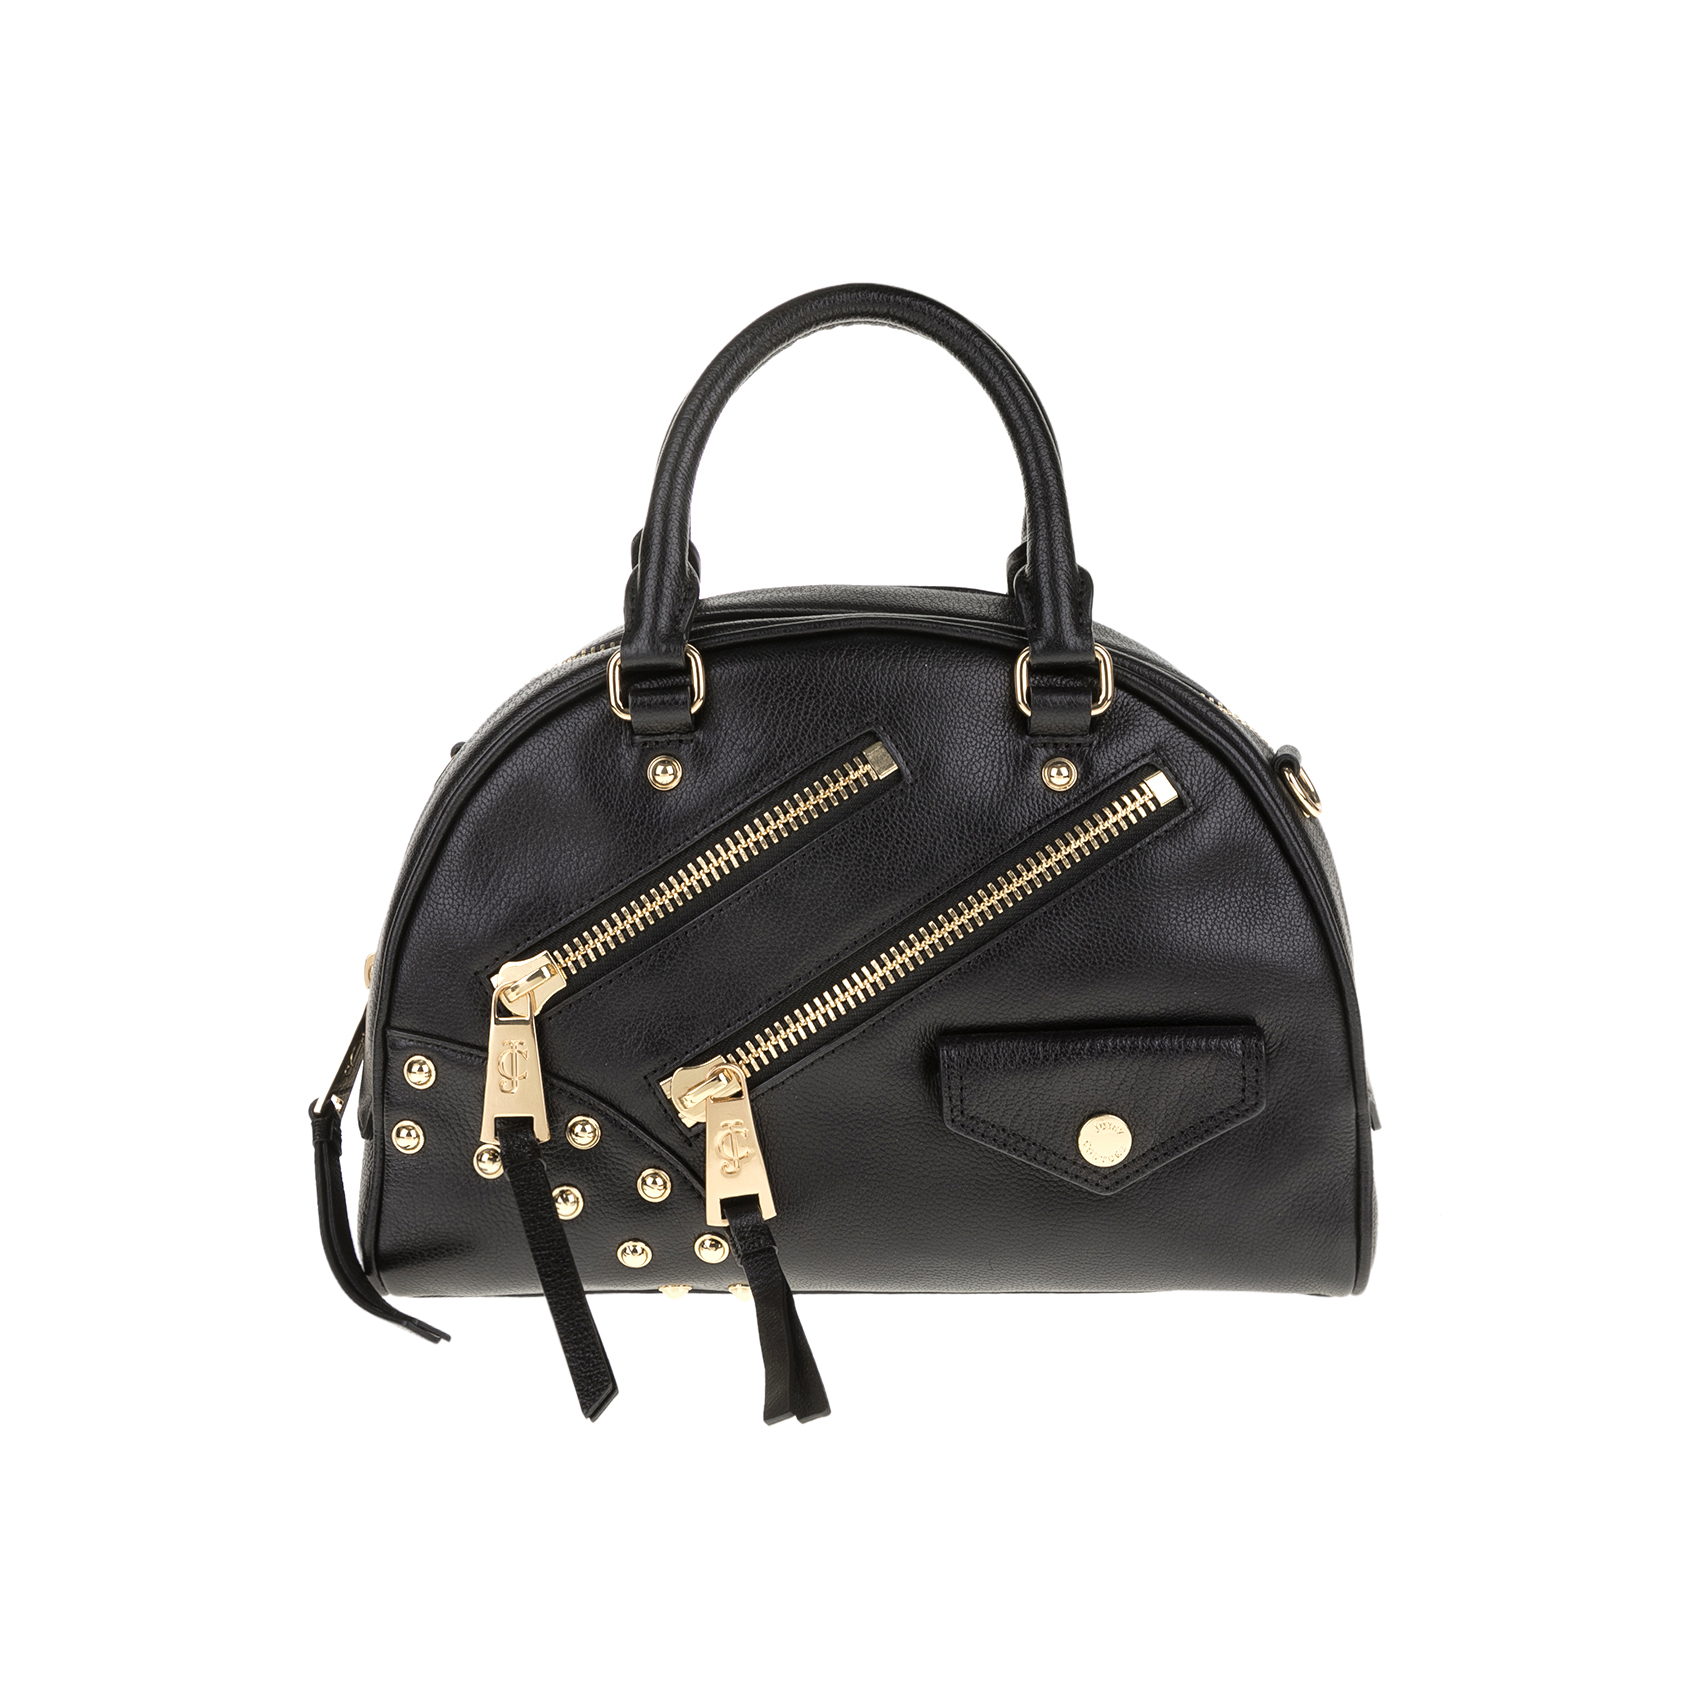 JUICY COUTURE - Γυναικεία τσάντα JUICY COUTURE OLYMPIC μαύρη 71d72c5513b